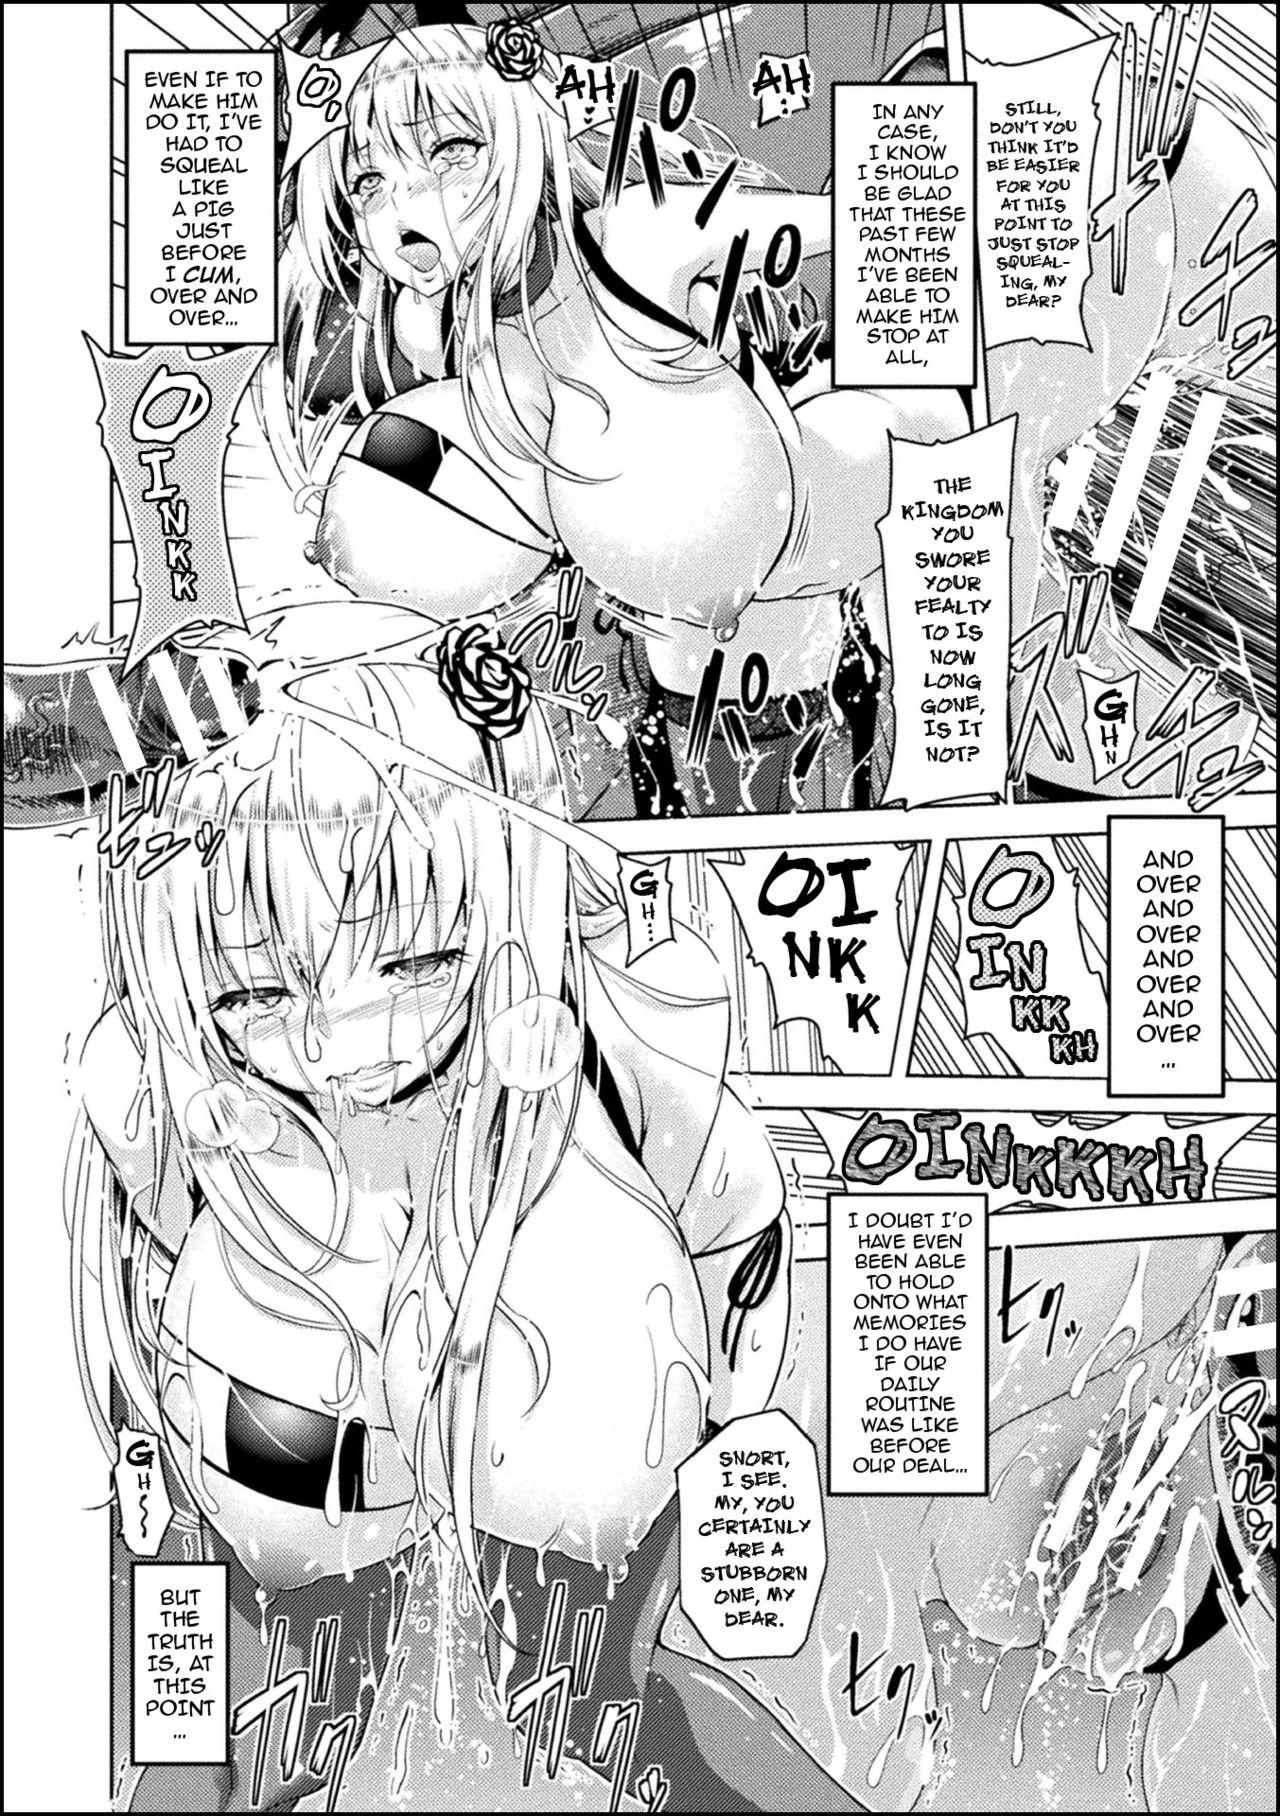 [Yamada Gogogo] Erona ~Orc no Inmon ni Okasareta Onna Kishi no Matsuro~   Erona ~The Fall of a Beautiful Knight Cursed with the Lewd Mark of an Orc~ Ch. 1-6 [English] {darknight} 54